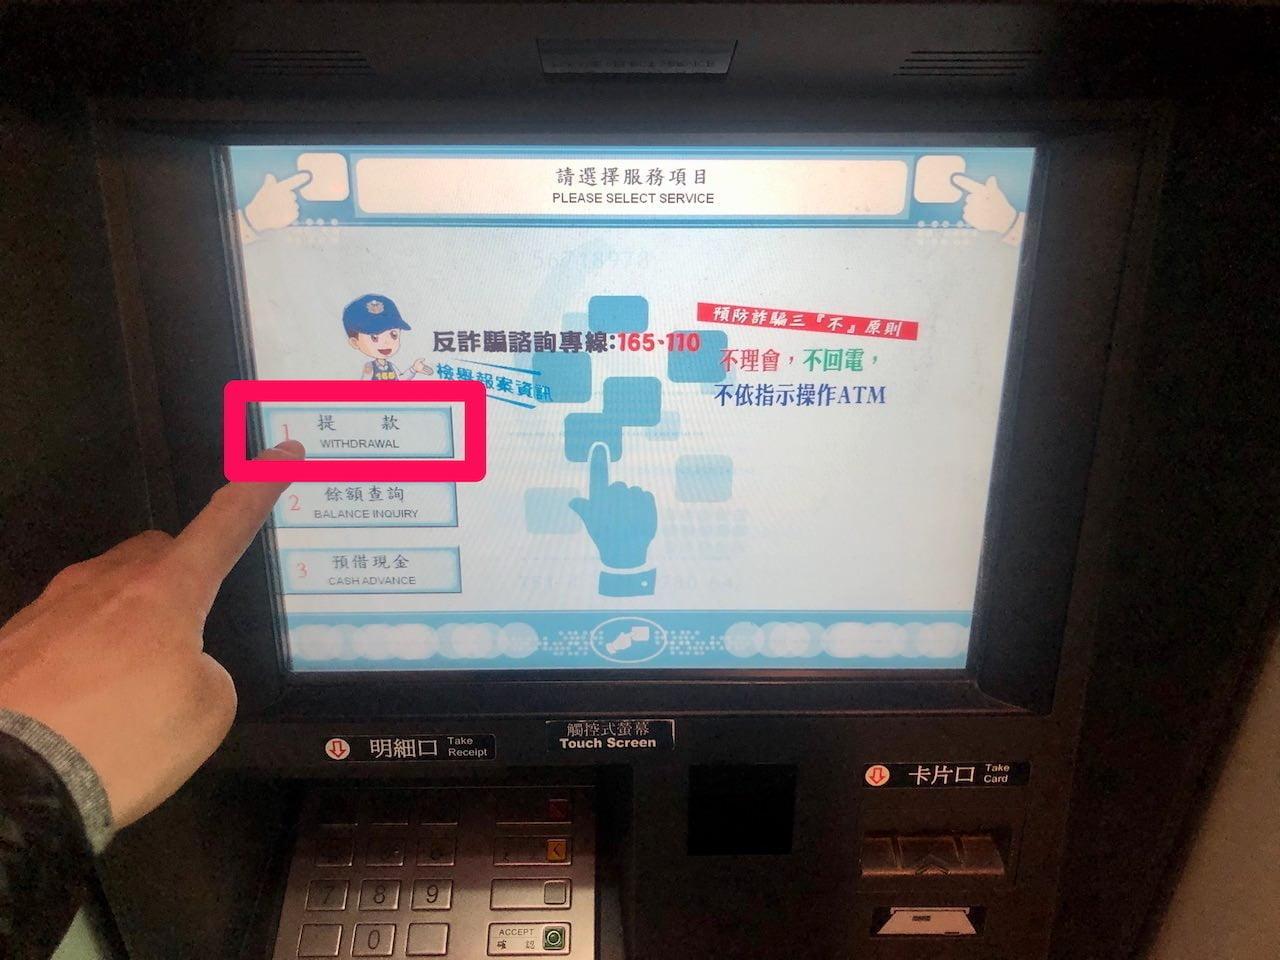 桃園空港の台湾銀行のATM